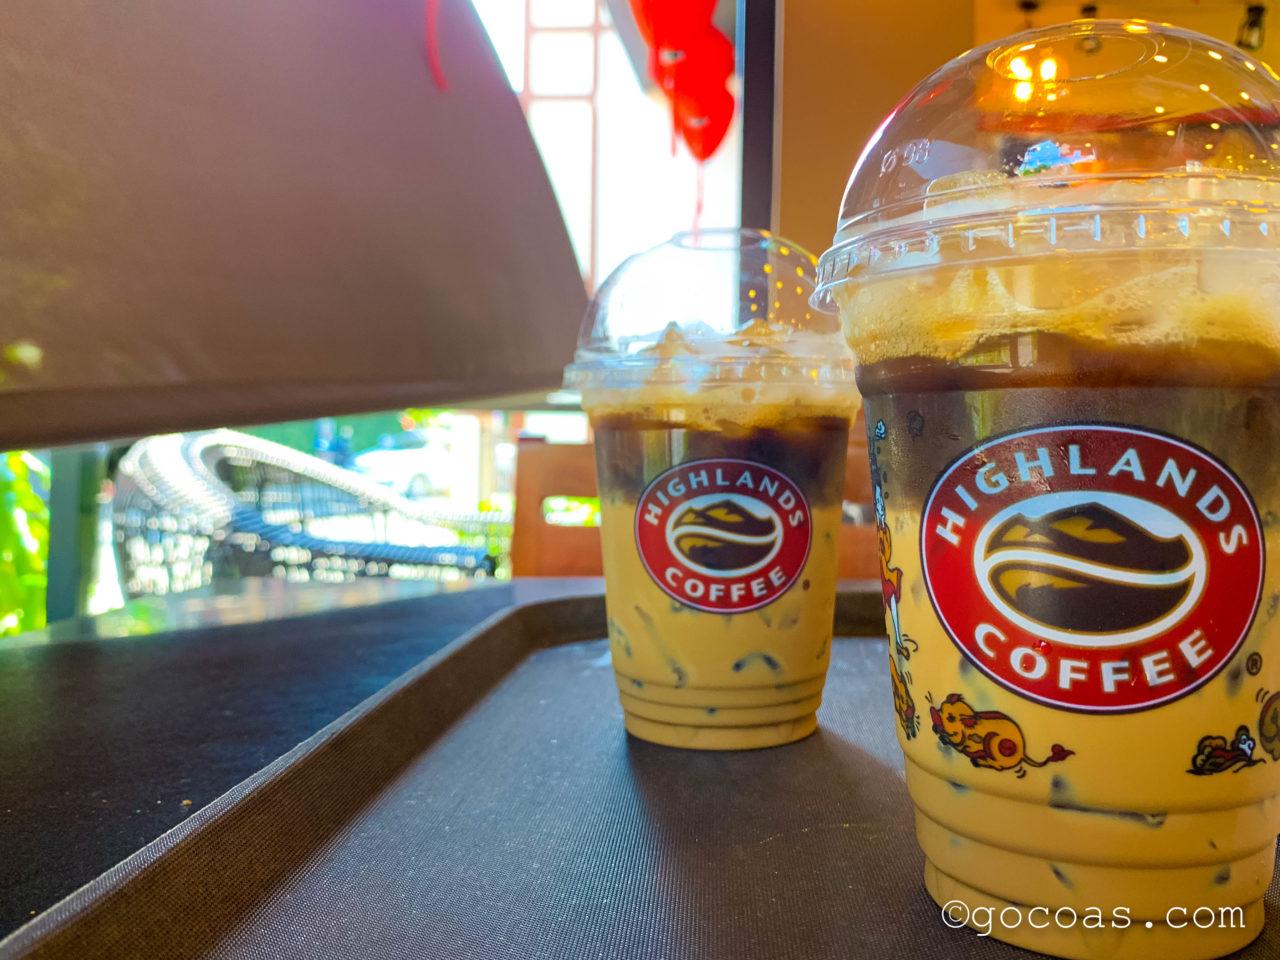 HIGHLANDS COFFEEホイアン